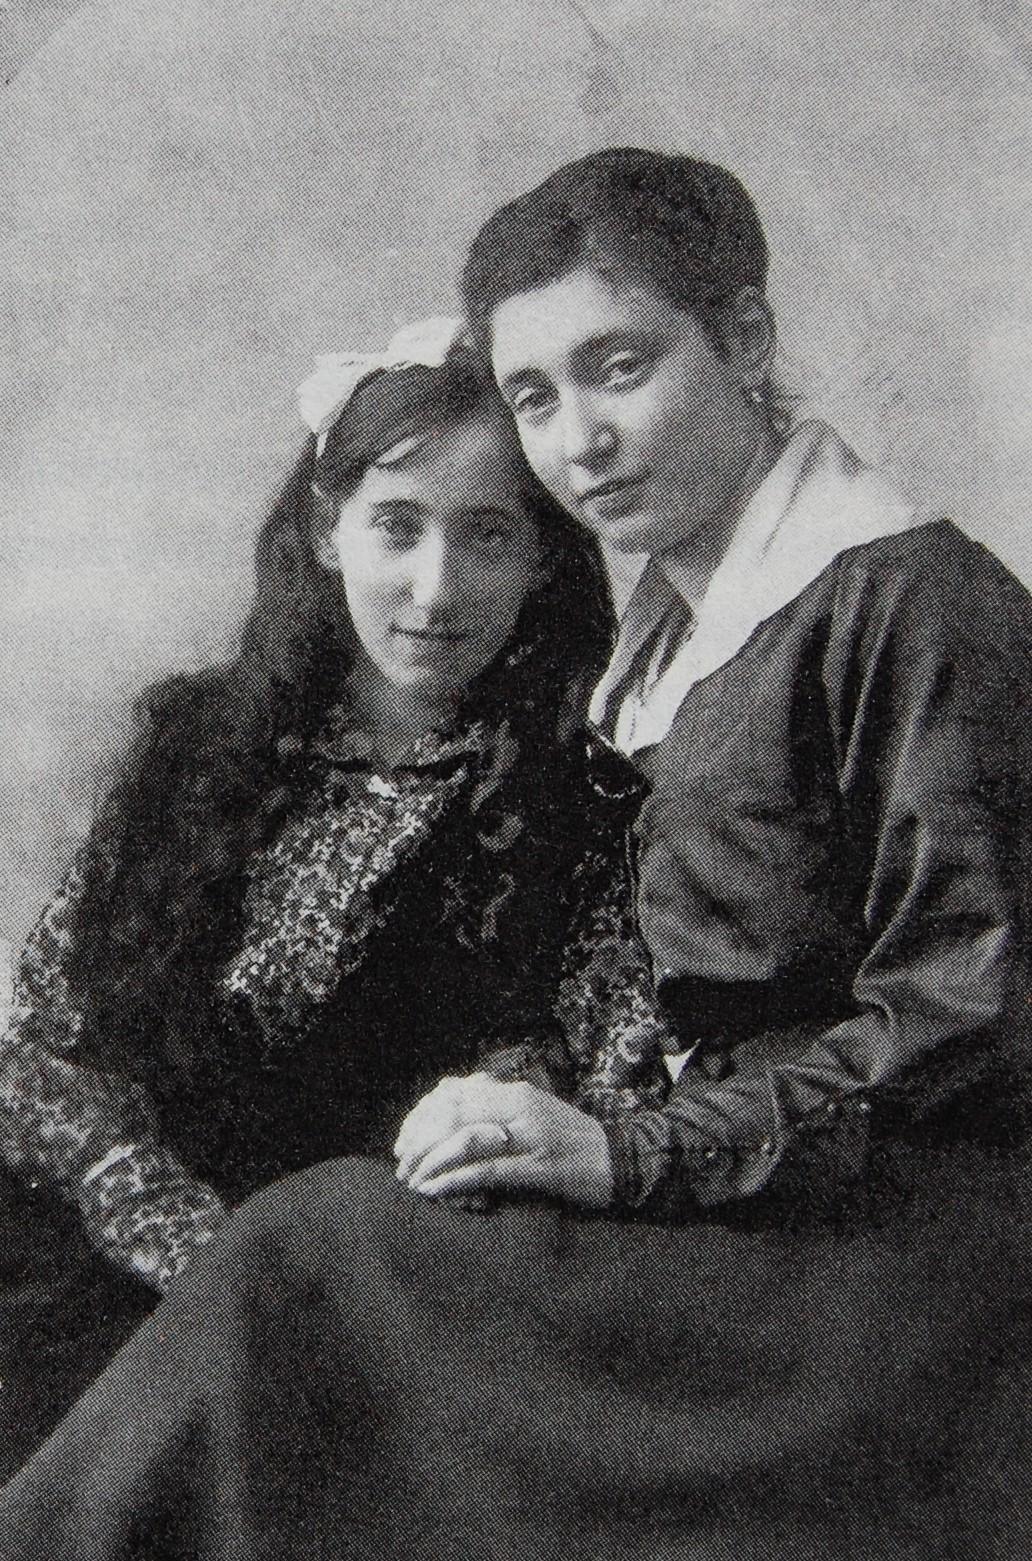 Martha und Else Rosenthal, um 1917